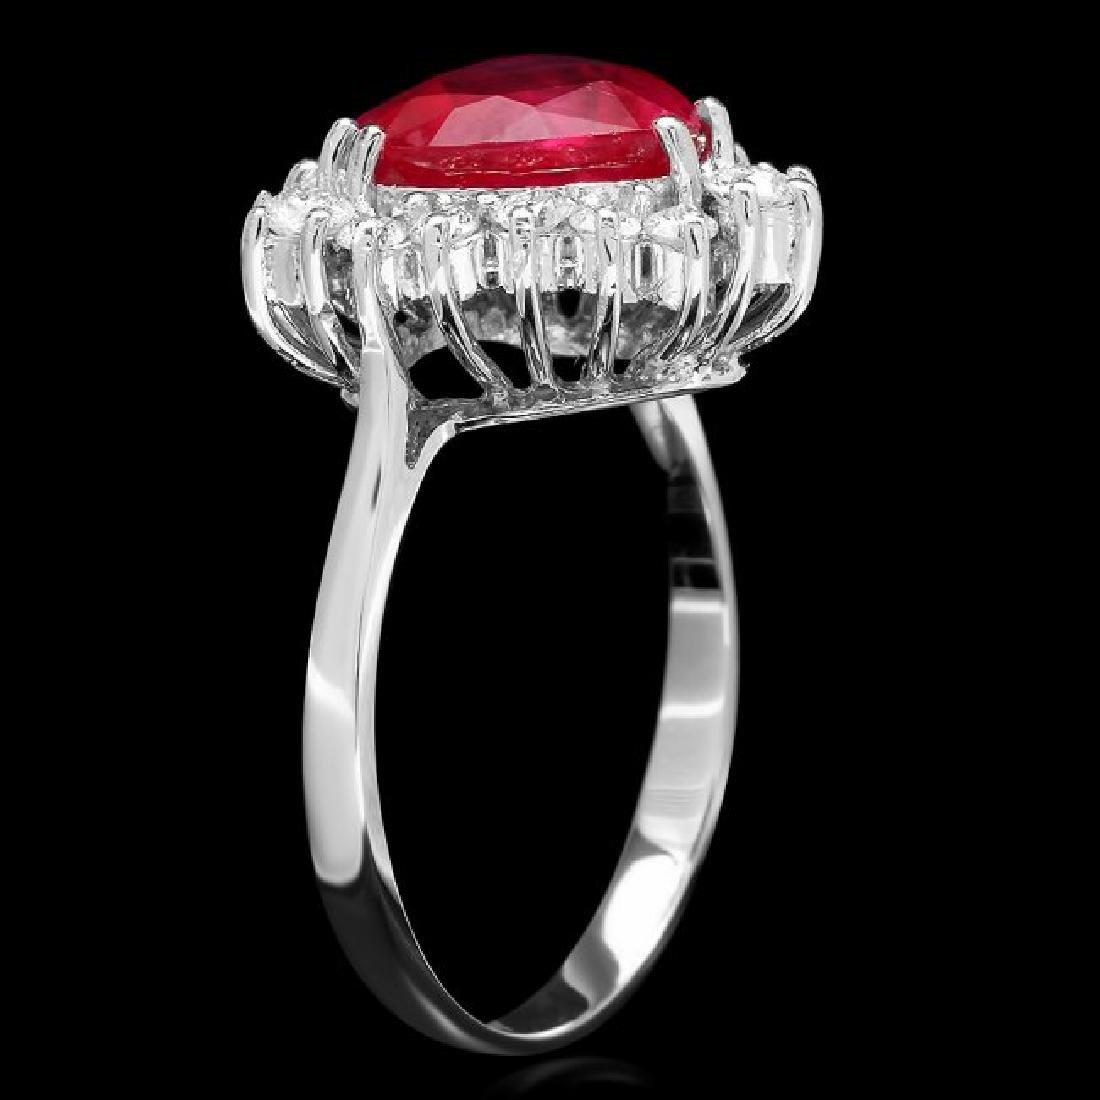 14k White Gold 2.50ct Ruby 0.60ct Diamond Ring - 2